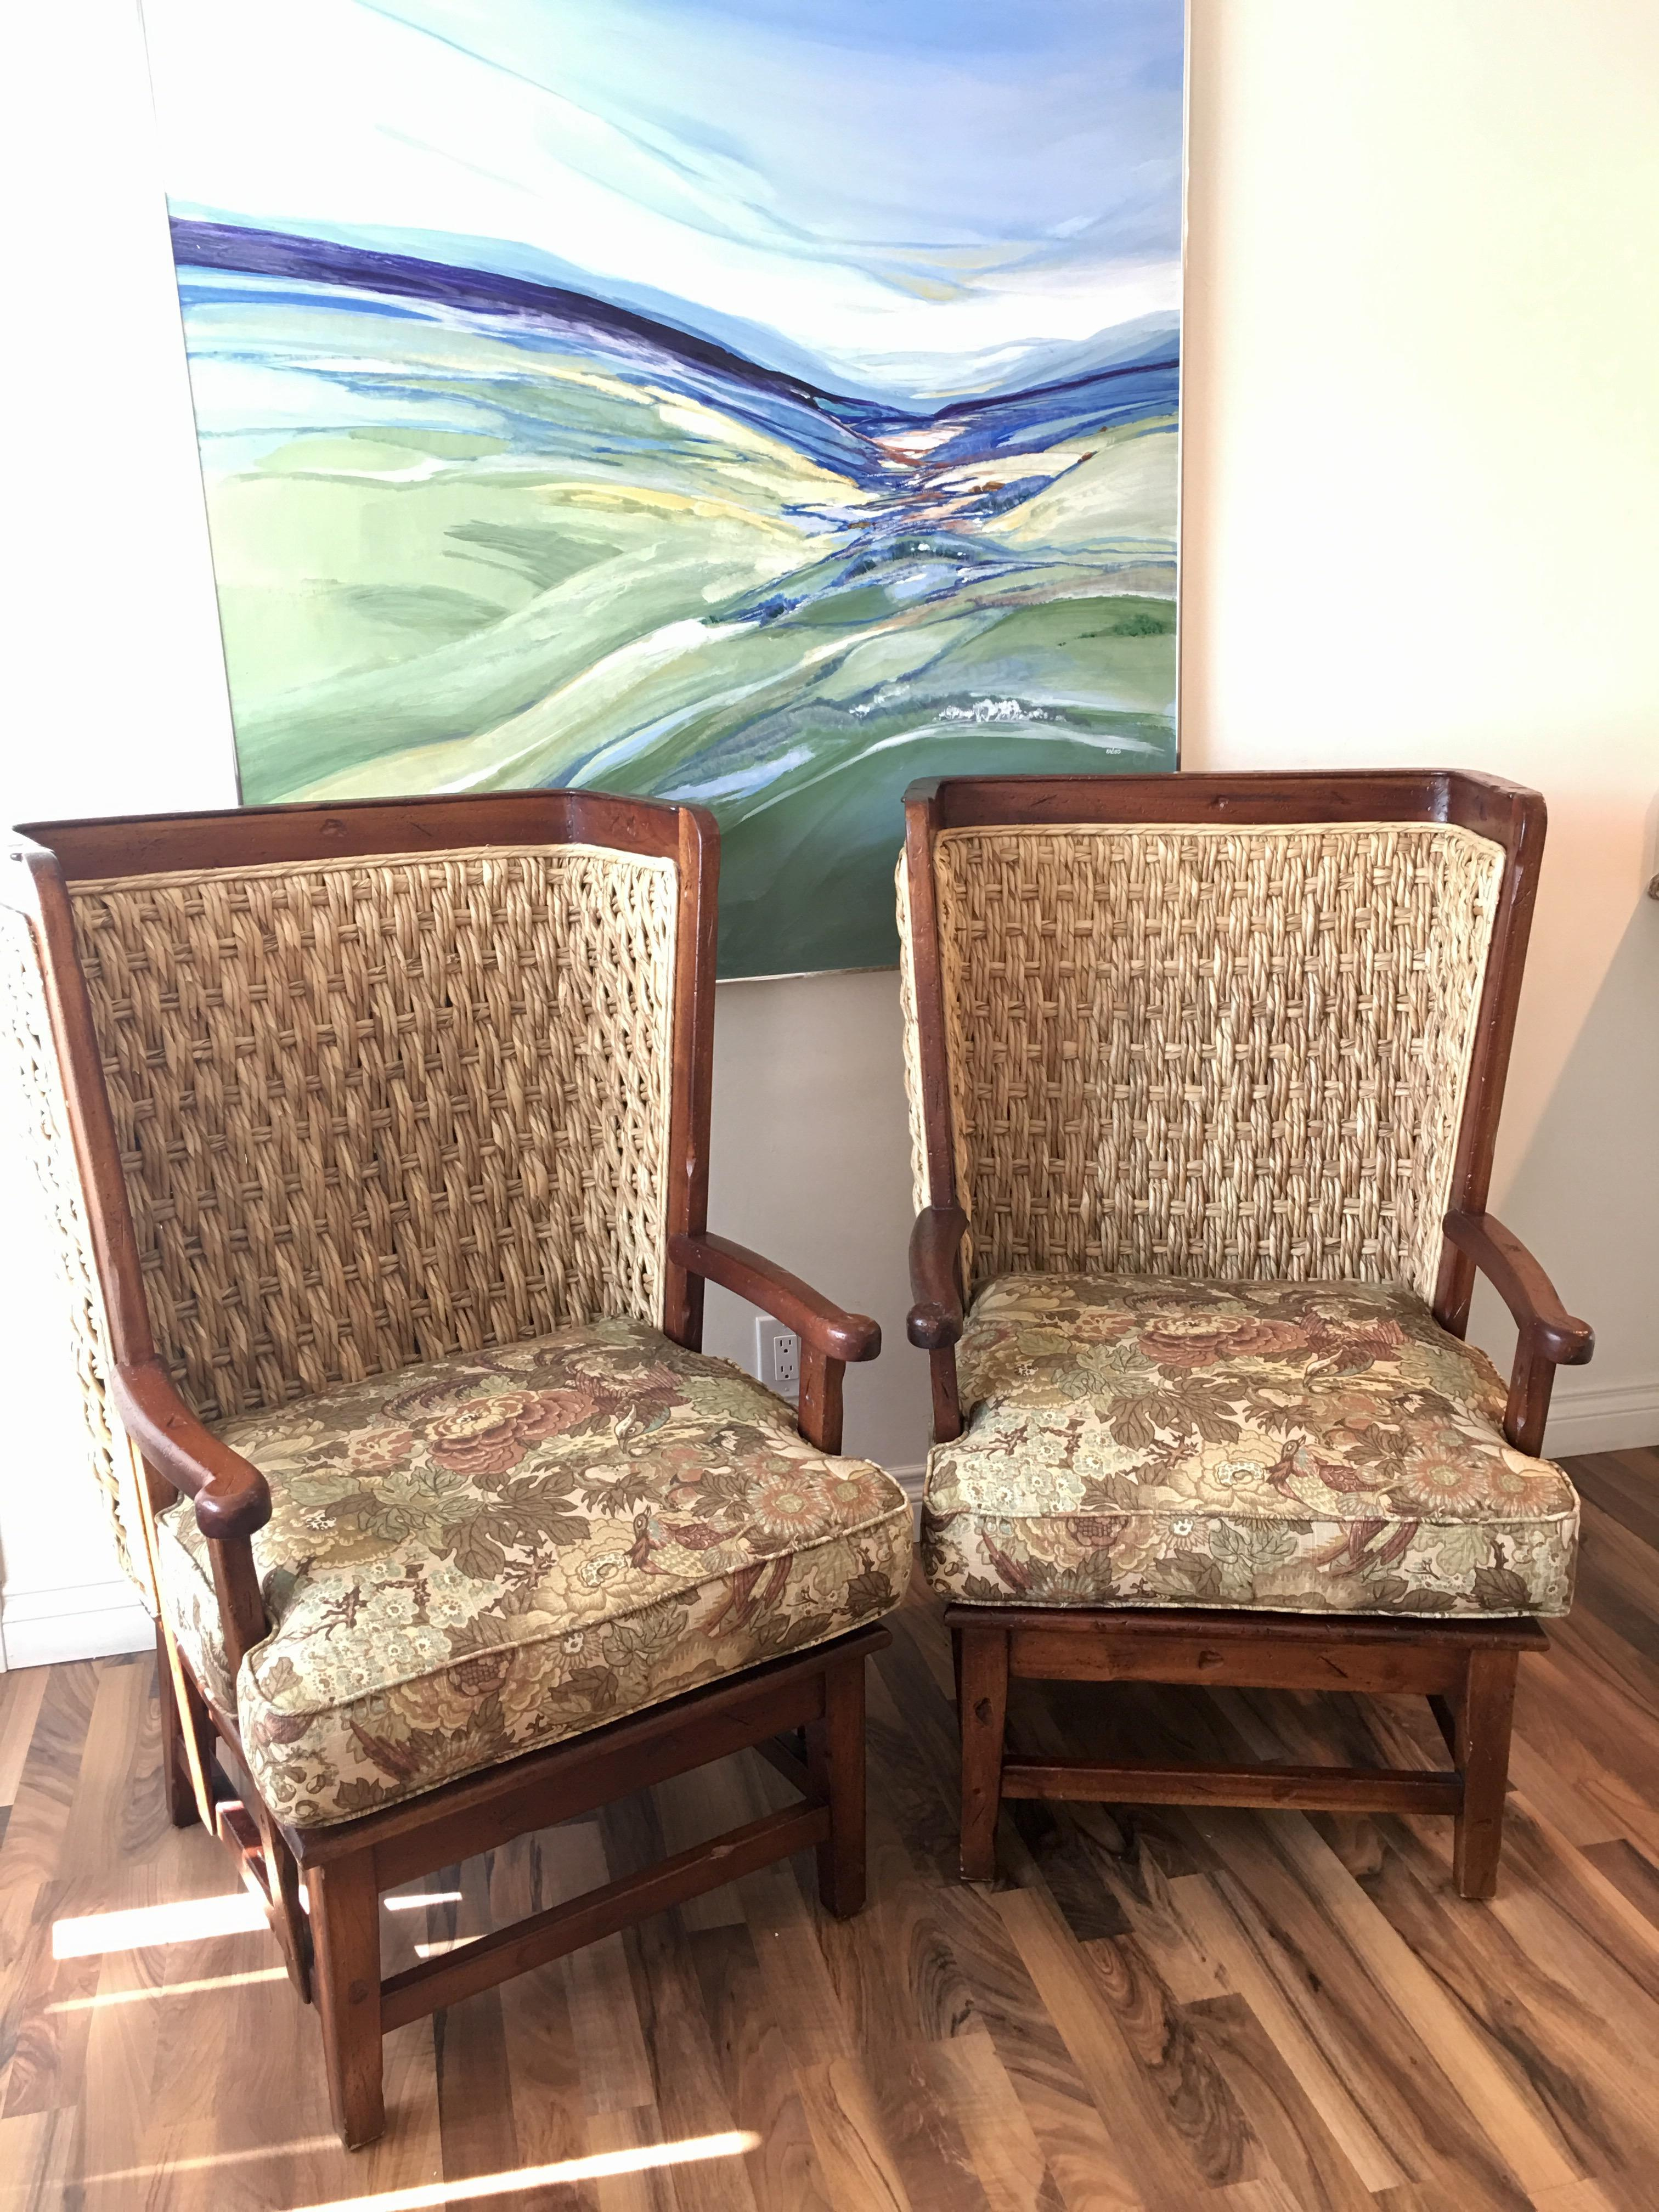 Ralph Lauren Home Orkney Wing Chairs U0026 Ottoman Set   3 Pcs.   Image 2